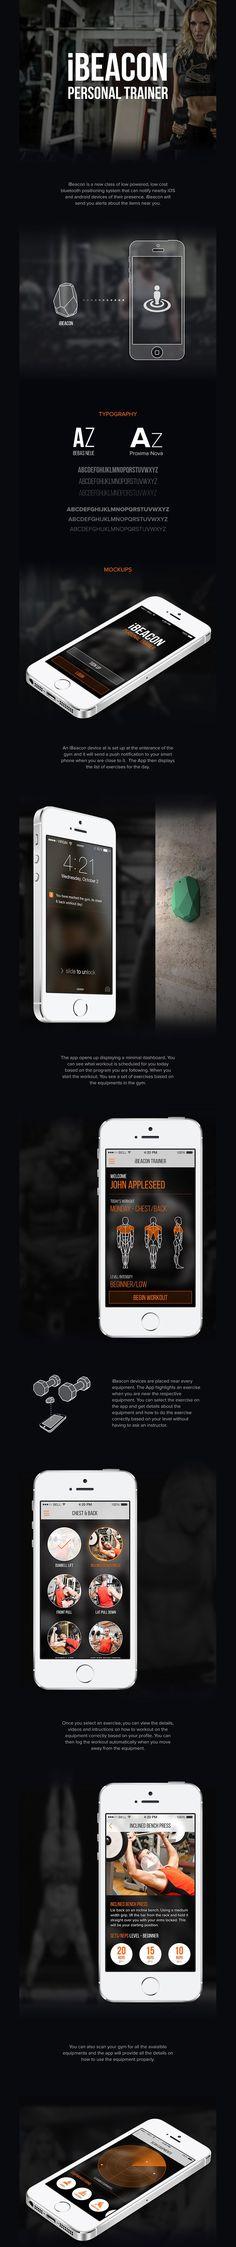 iBeacon Gym App Mobile Ui Design, App Design, Ui Design Inspiration, User Interface Design, App Development, Cool Websites, Ios, Technology, Digital